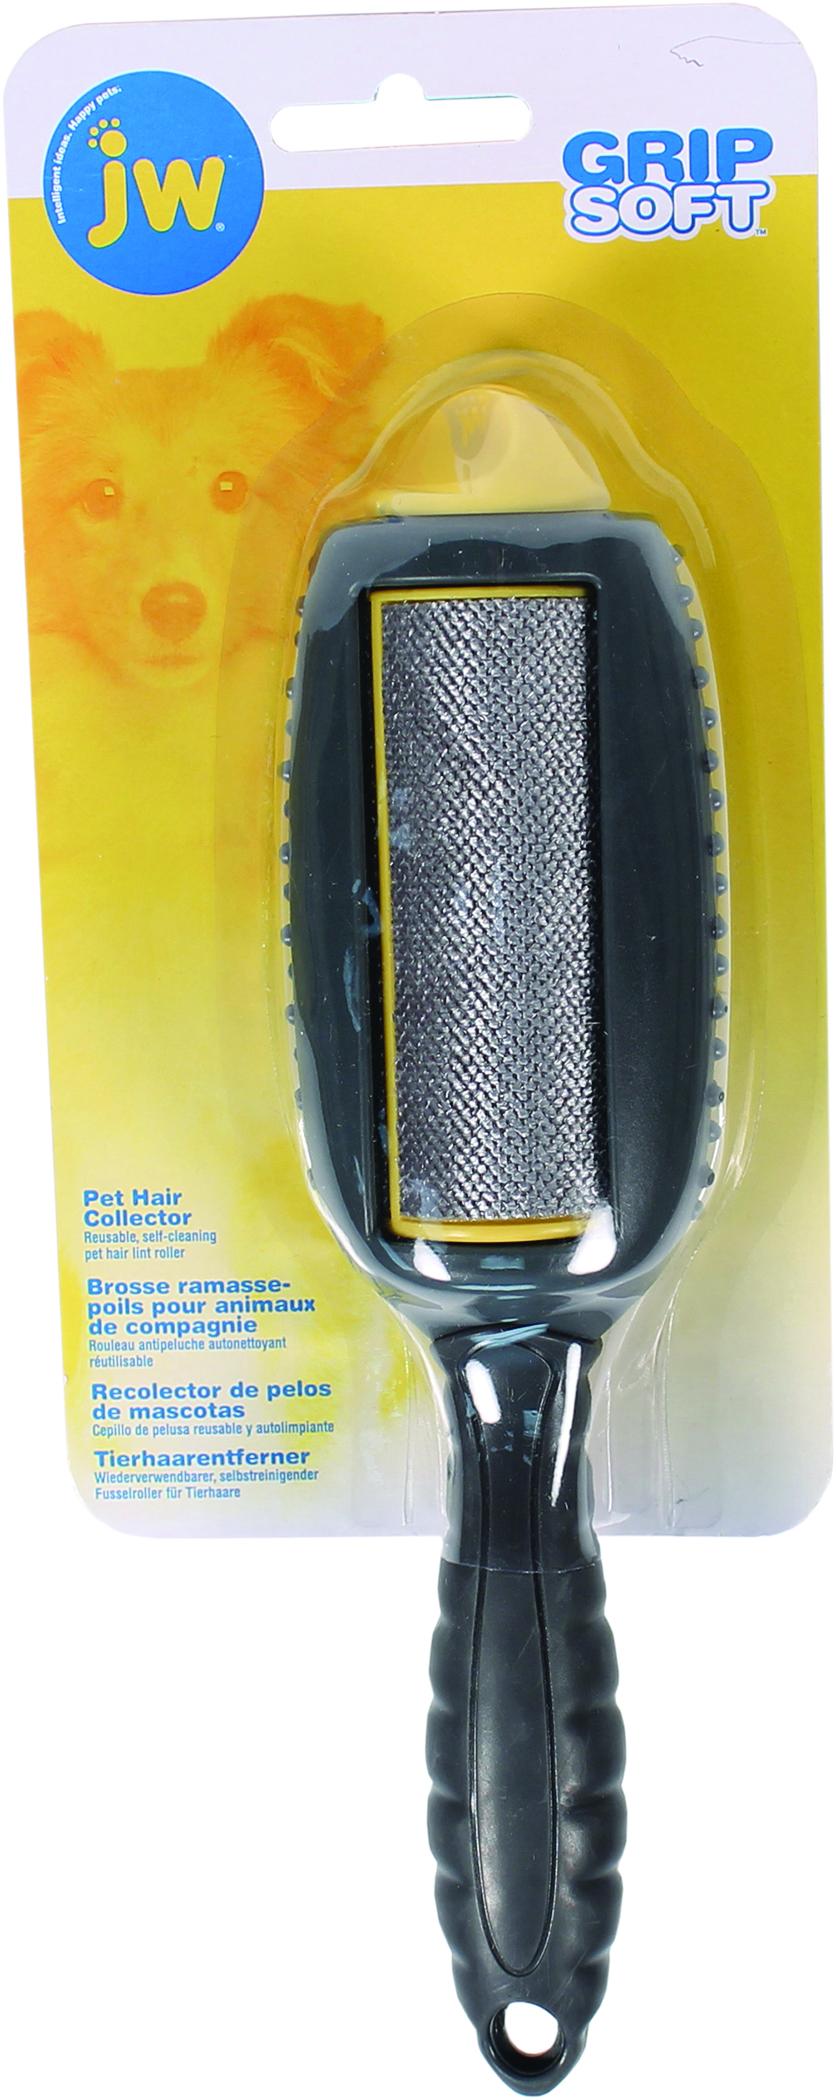 JW Grip Soft Pet Hair Collector